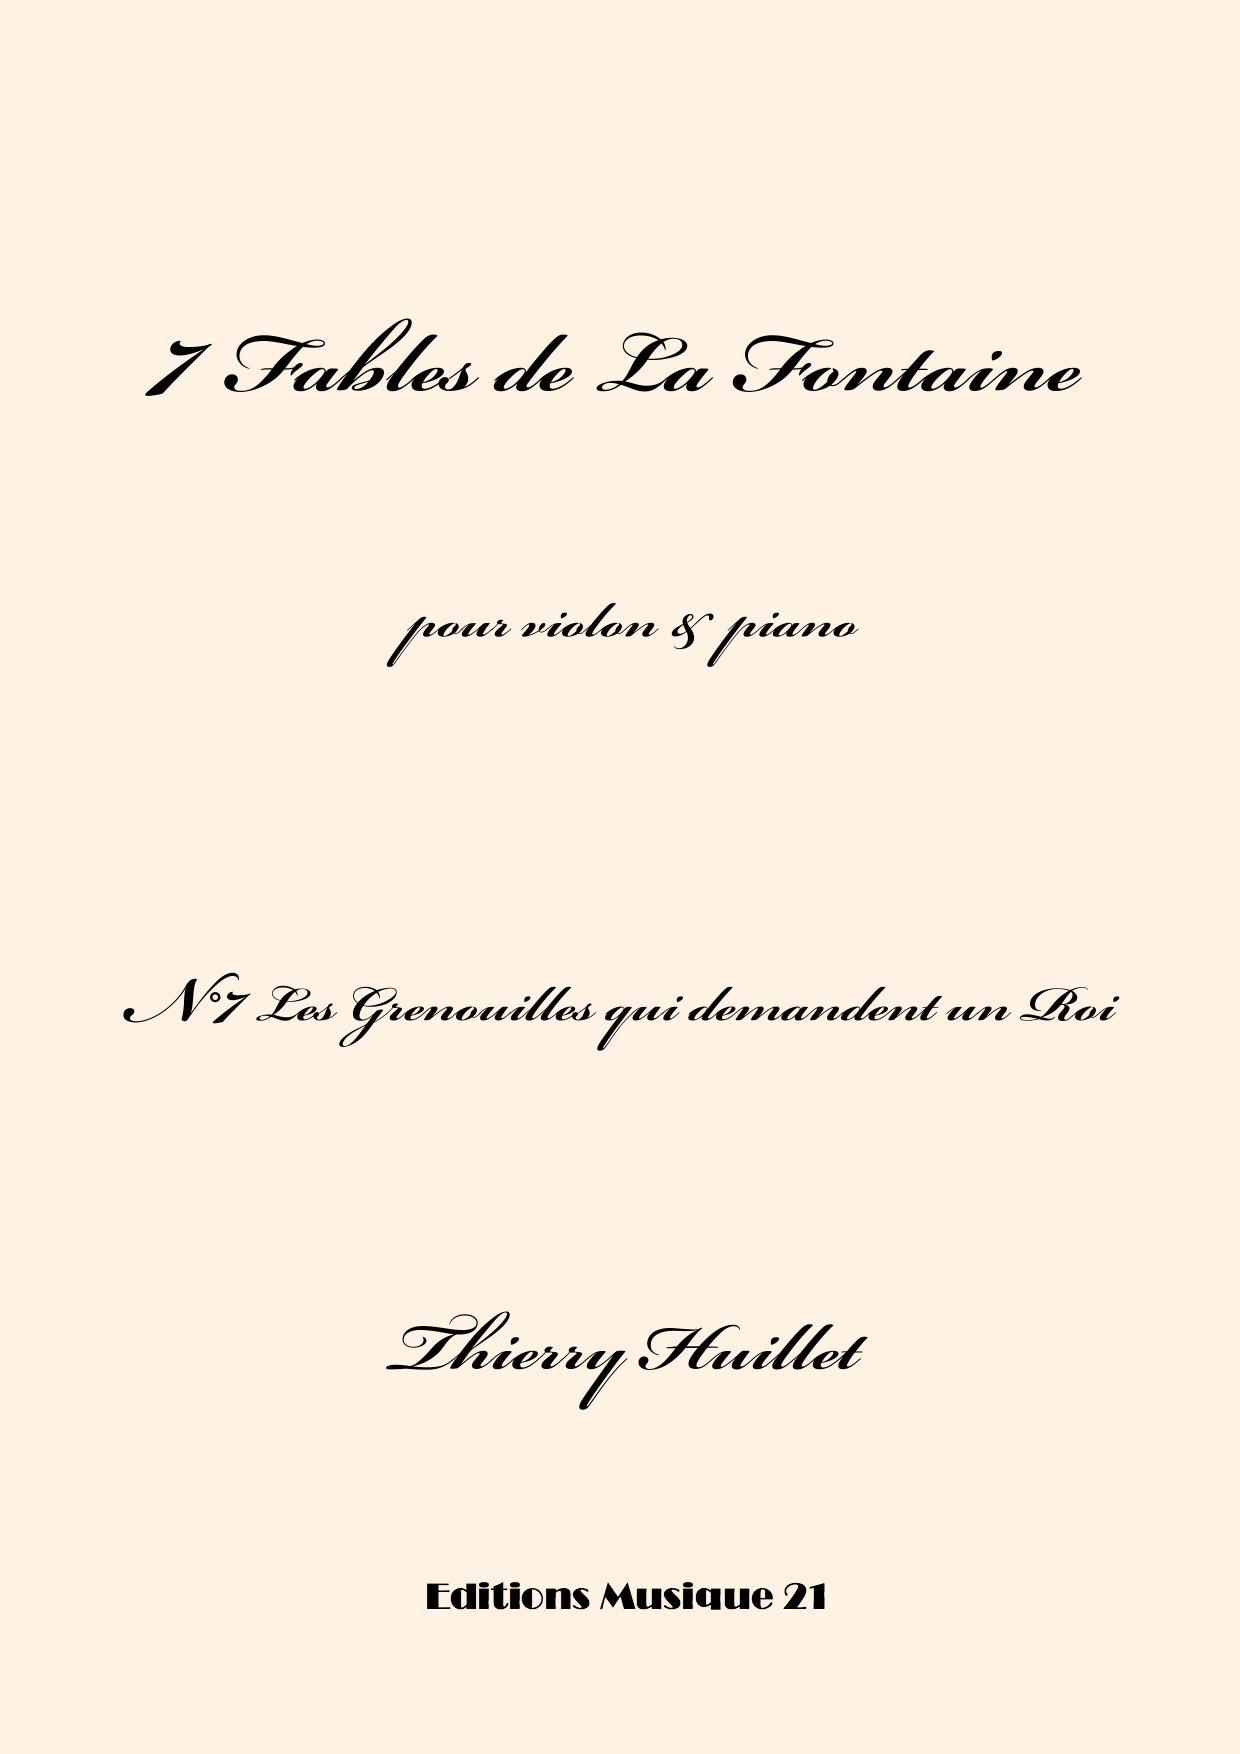 Thierry HUILLET – Les Grenouilles Qui Demandent Un Roi, N°7 From 7 Fables De La Fontaine, For Violin And Piano